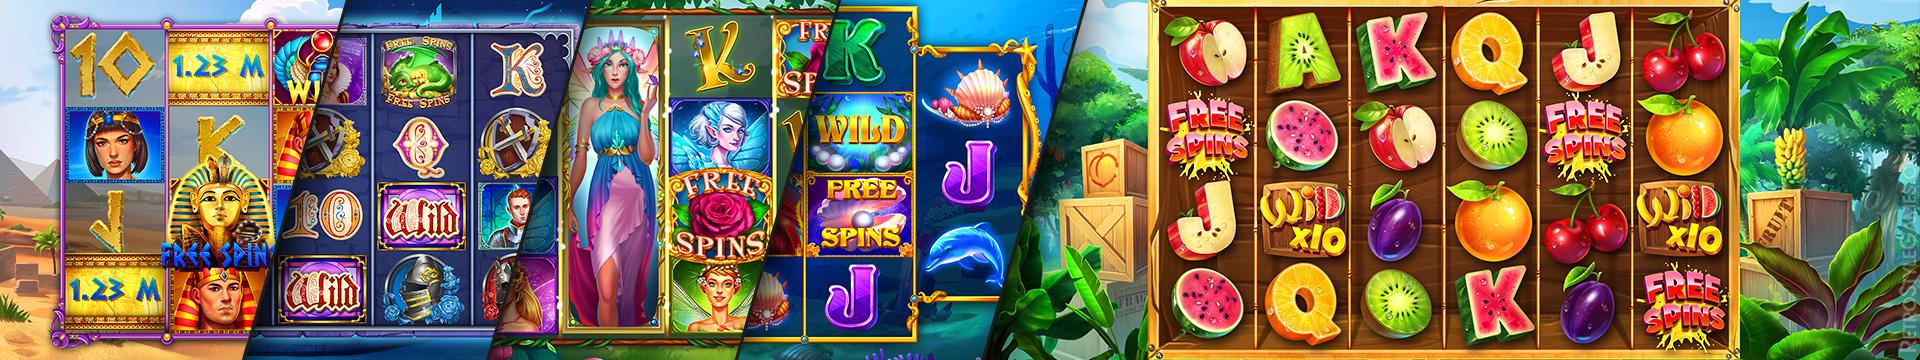 Game 2D Background Slot Machine Treasure Fruit